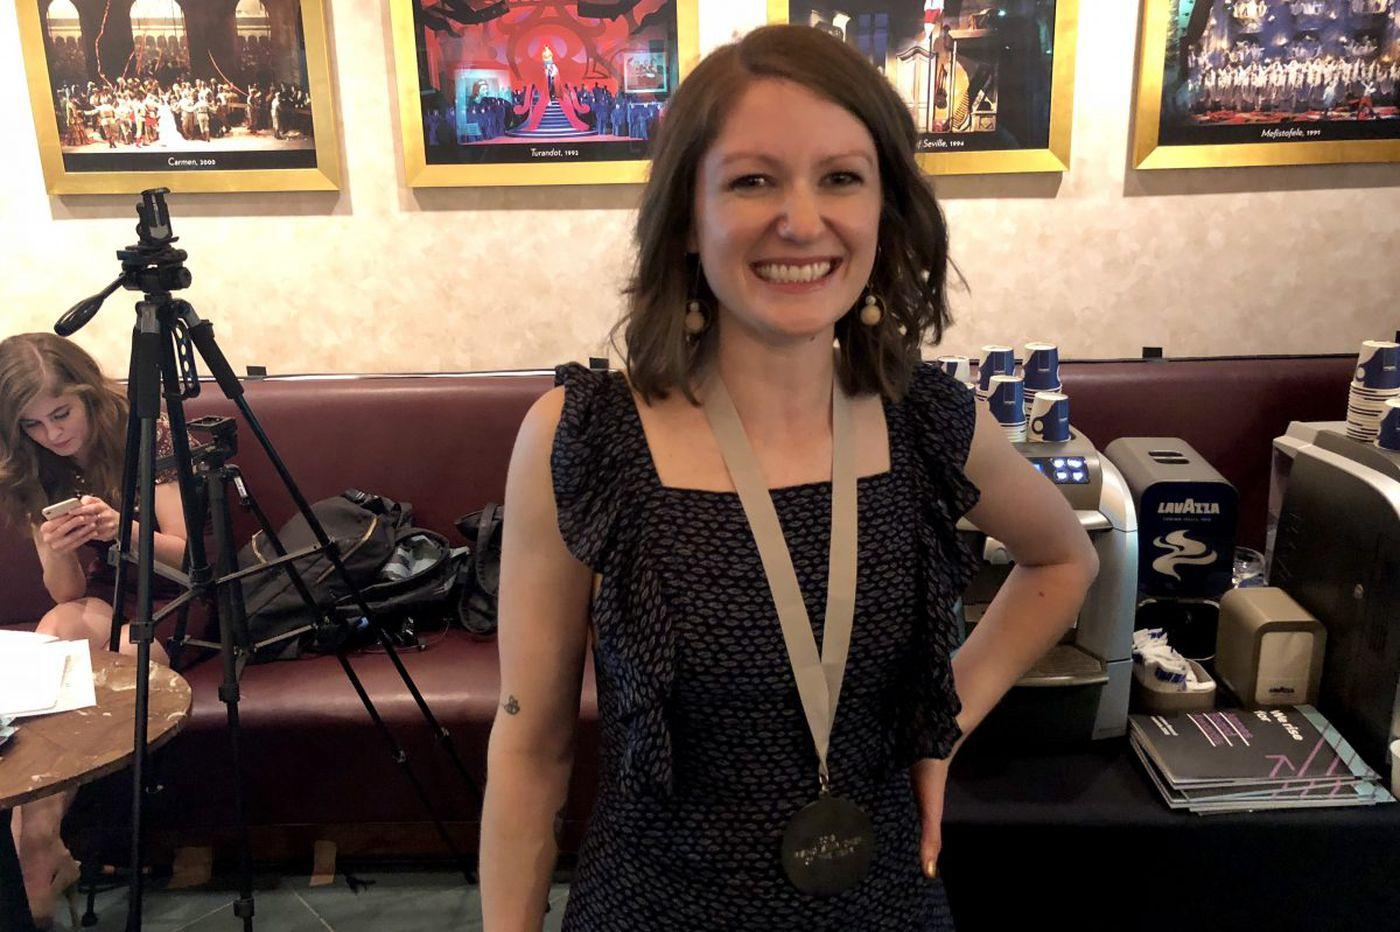 James Beard Awards: Zahav's Camille Cogswell wins for rising-star chef